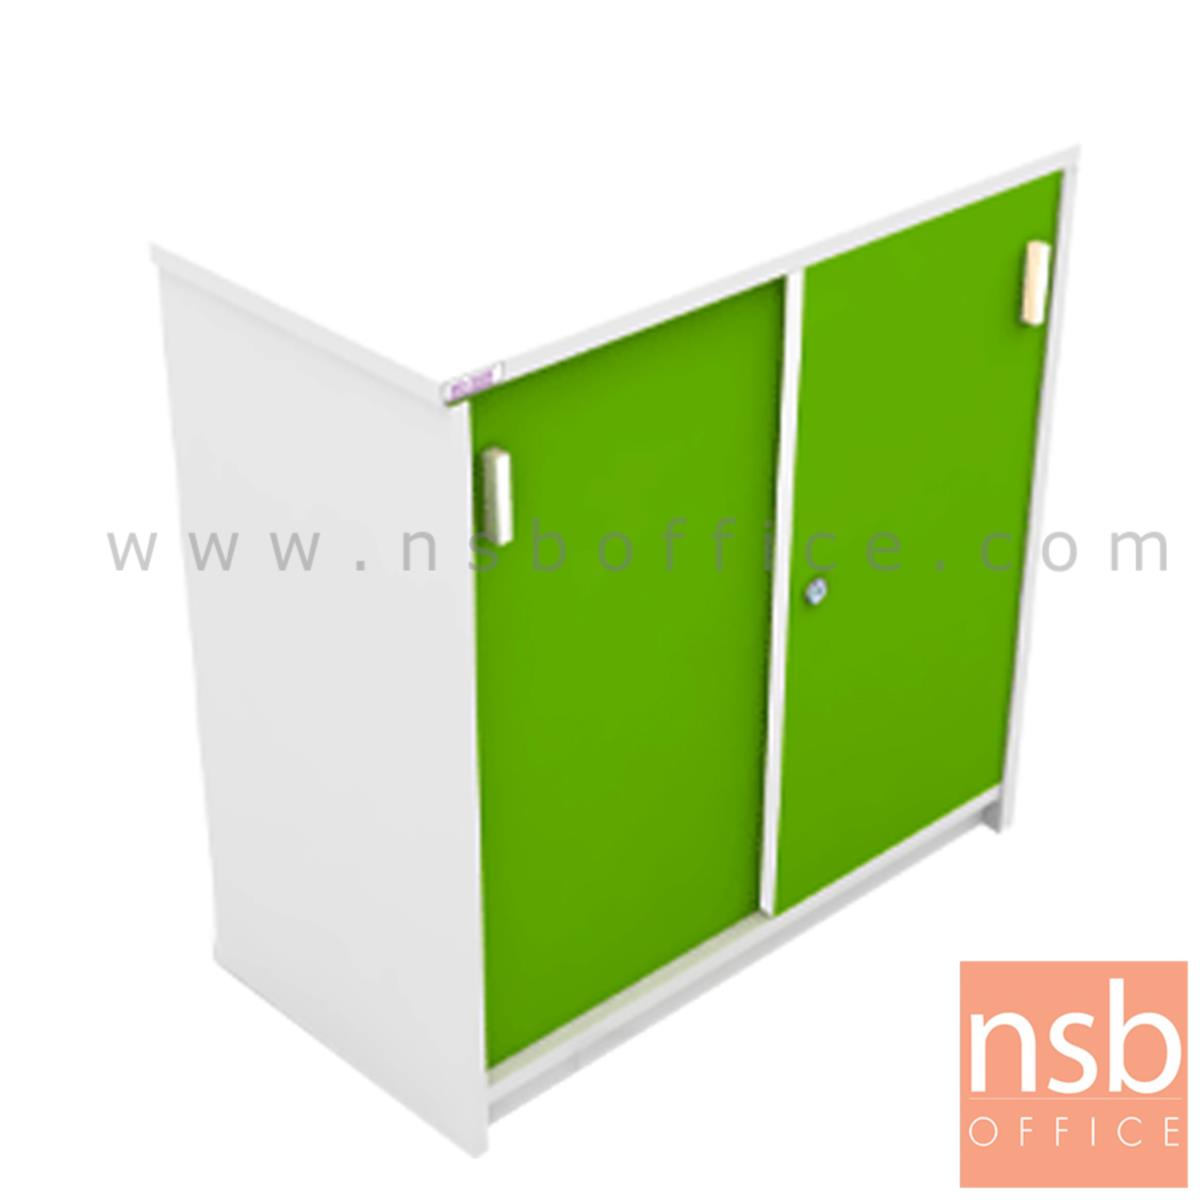 A20A010:ตู้เอกสารสีสัน สูง 85H cm. 2 บานเลื่อน รุ่น MT-COLOUR-028L   พร้อมกุญแจล็อค